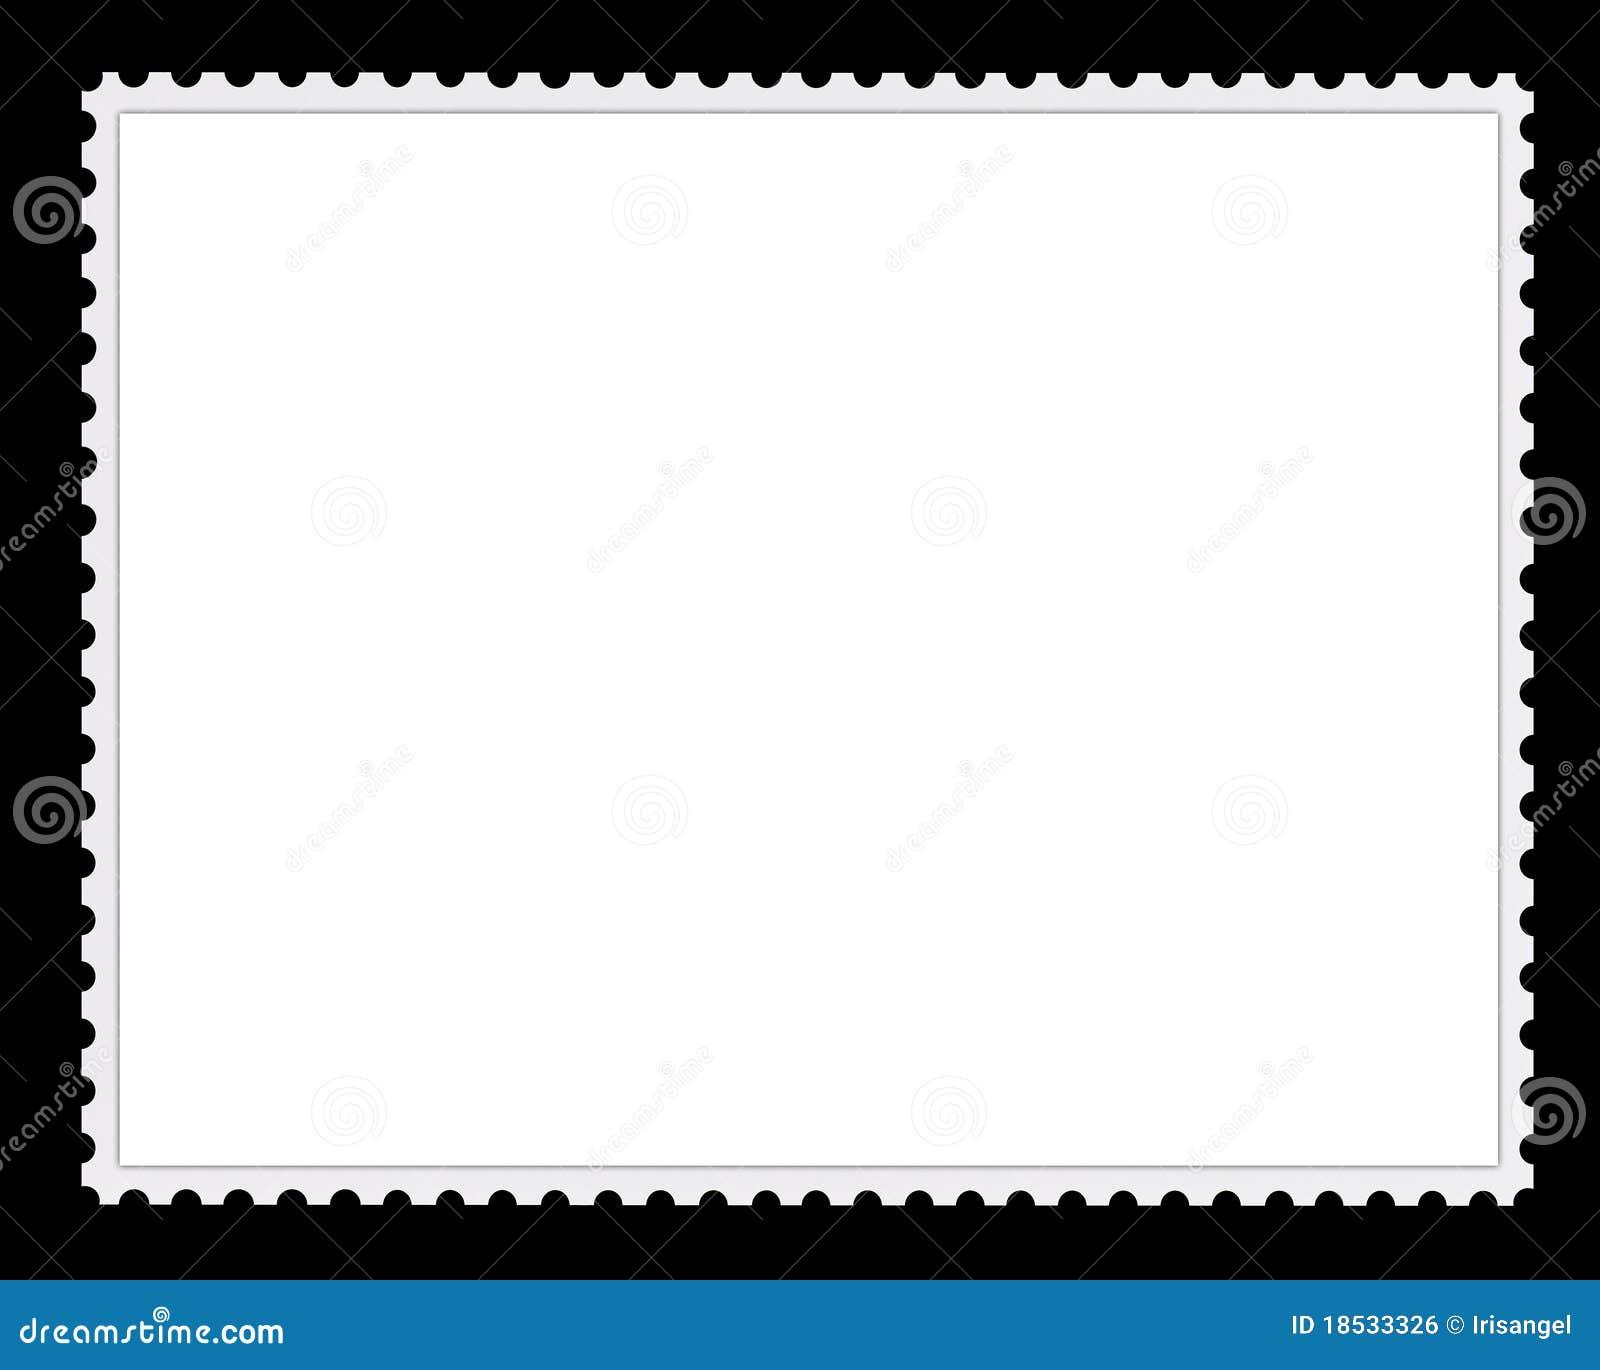 borders template